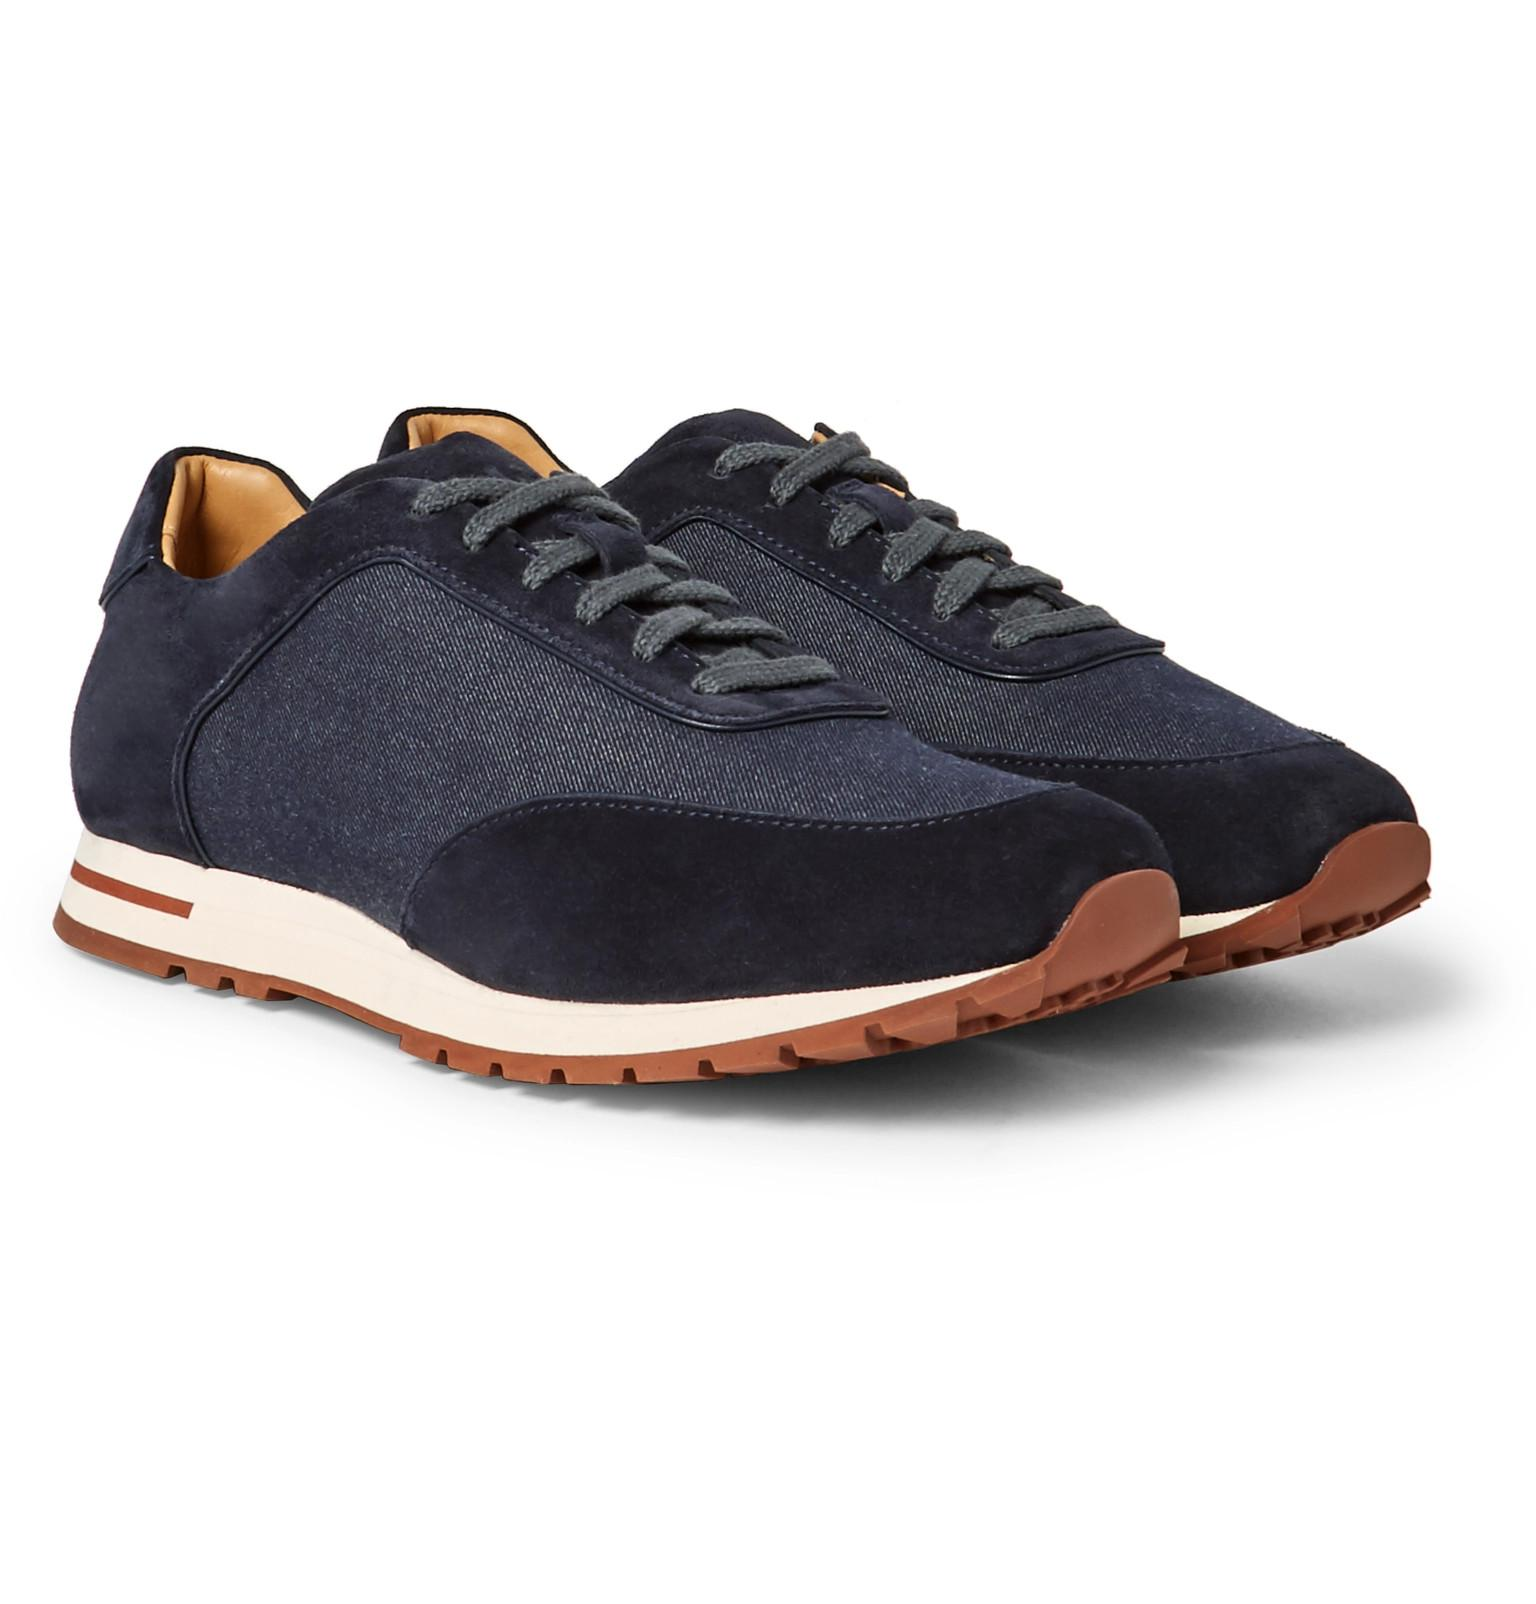 Mens Weekend Walk Suede Sneakers Loro Piana zP56arUfJ